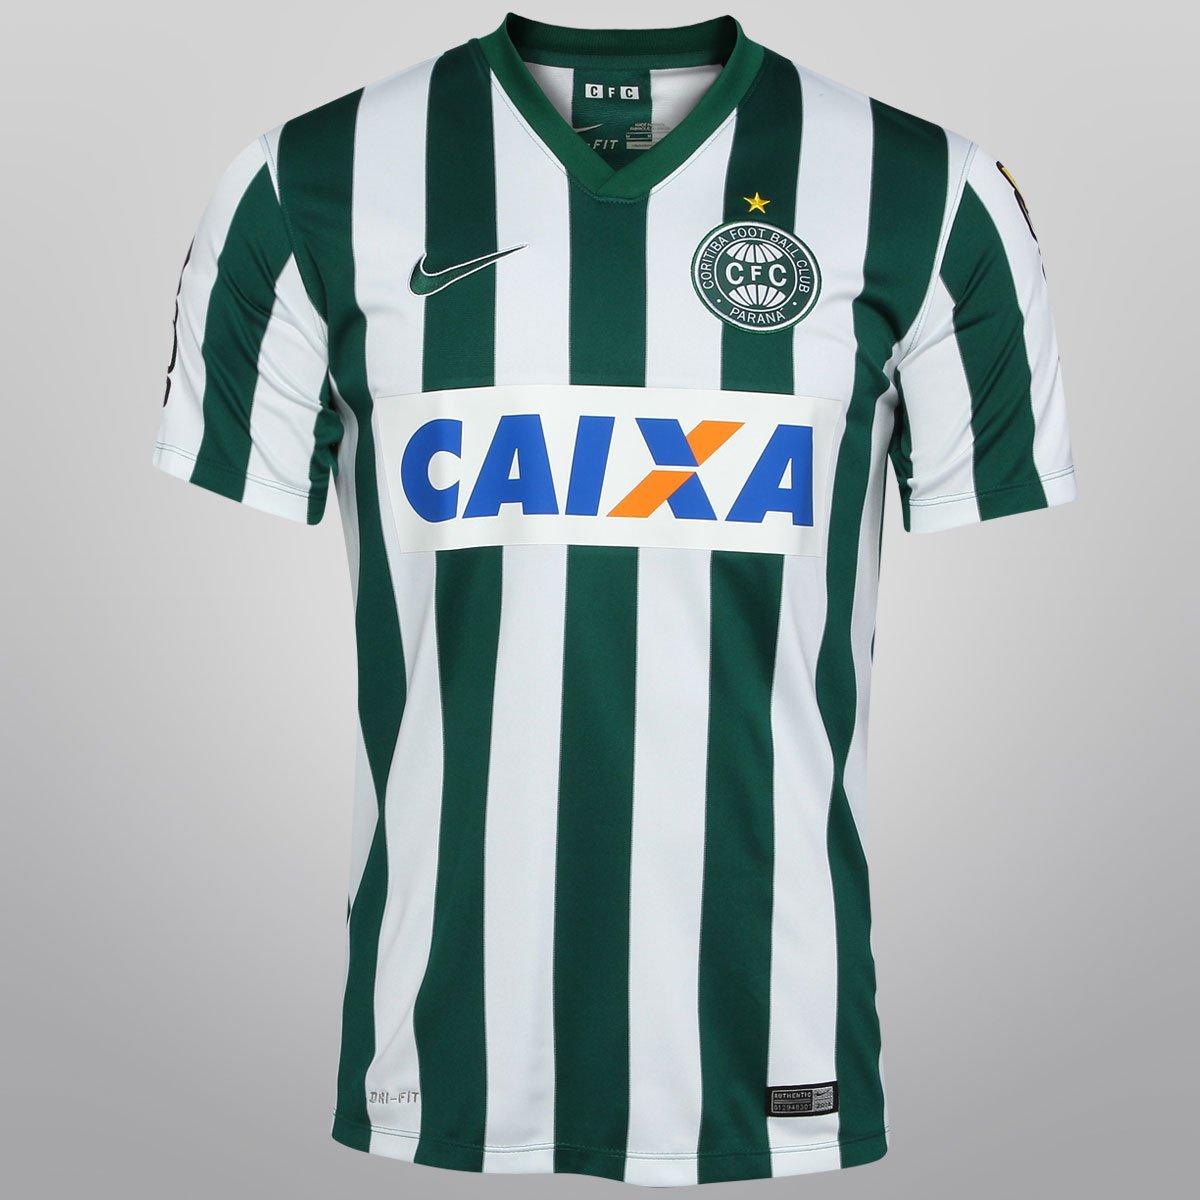 bdd704c727b02 Camisa Nike Coritiba Jogadeira 14 15 s nº c  Patrocínio - Compre Agora